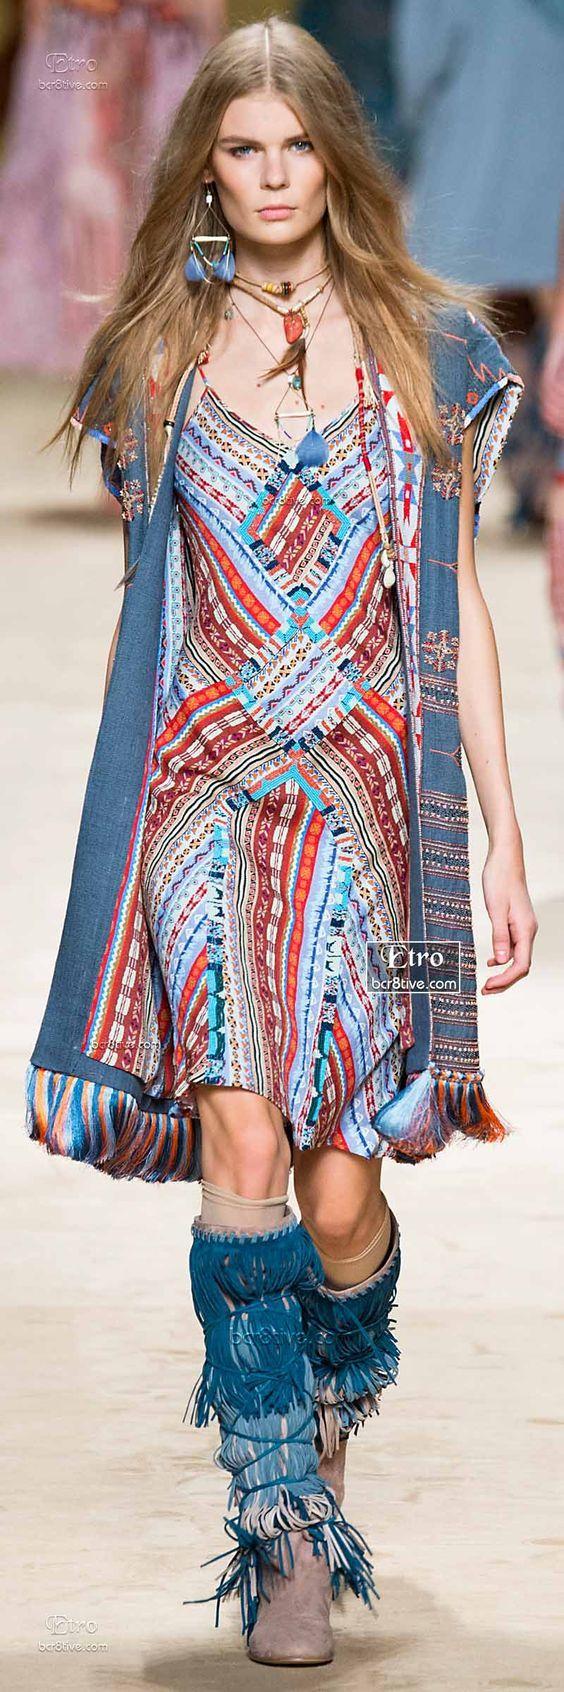 Boho Let's Go! Dress Designer Fashion Trends Etro Spring 2015-16 RTW Collection: